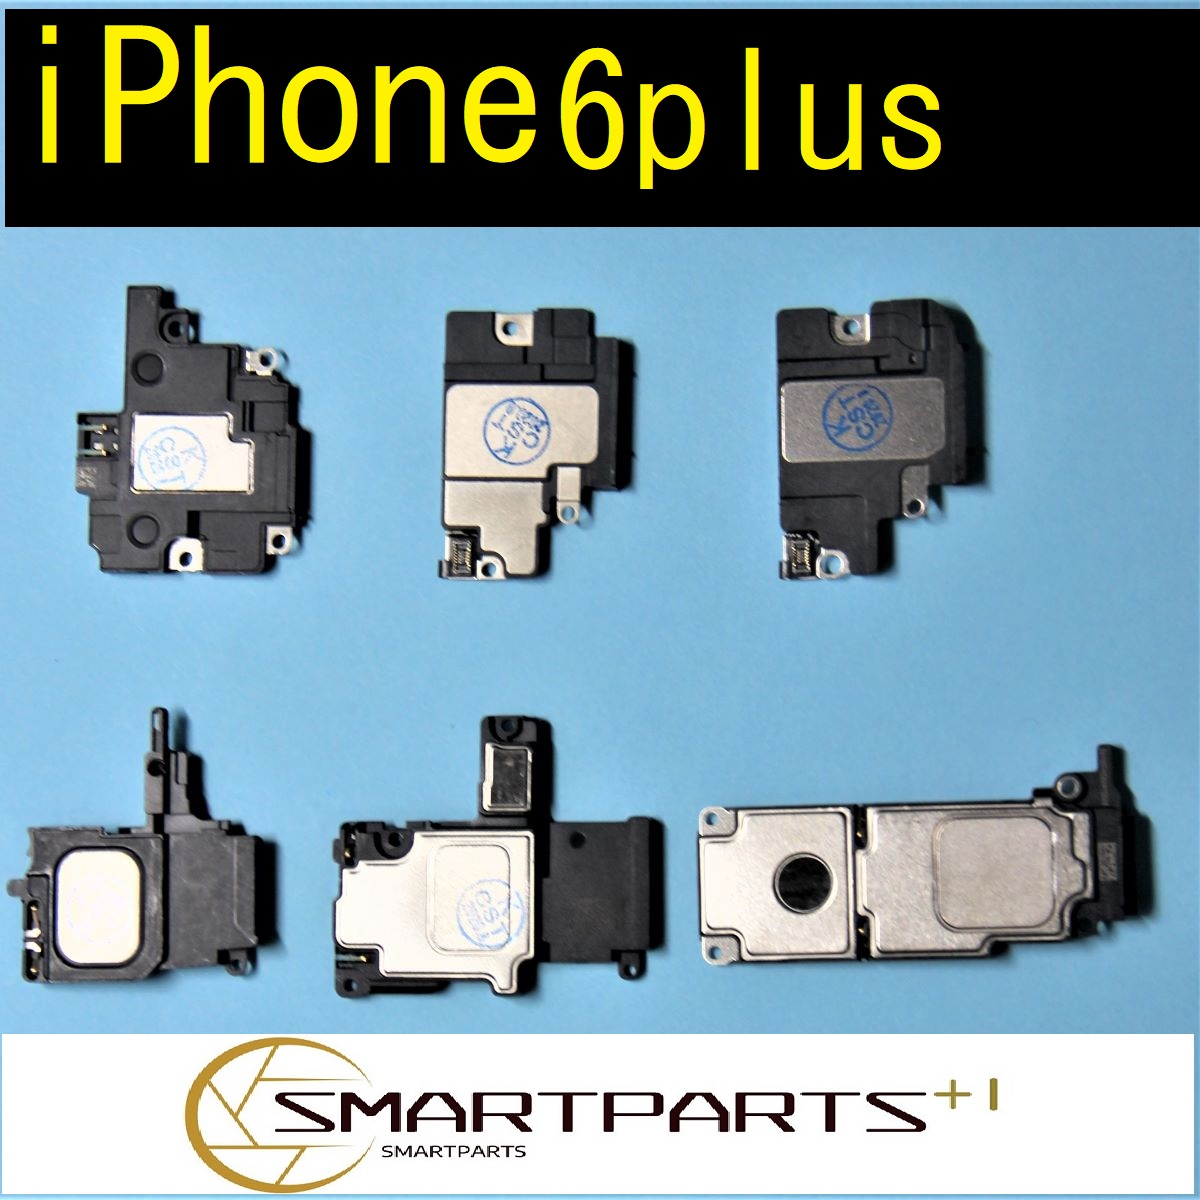 iPhone6plusラウドスピーカー 修理工具セット付き 下部スピーカー 驚きの値段 メーカー再生品 修理交換パーツ リペア部品 DIY修理 アイフォン